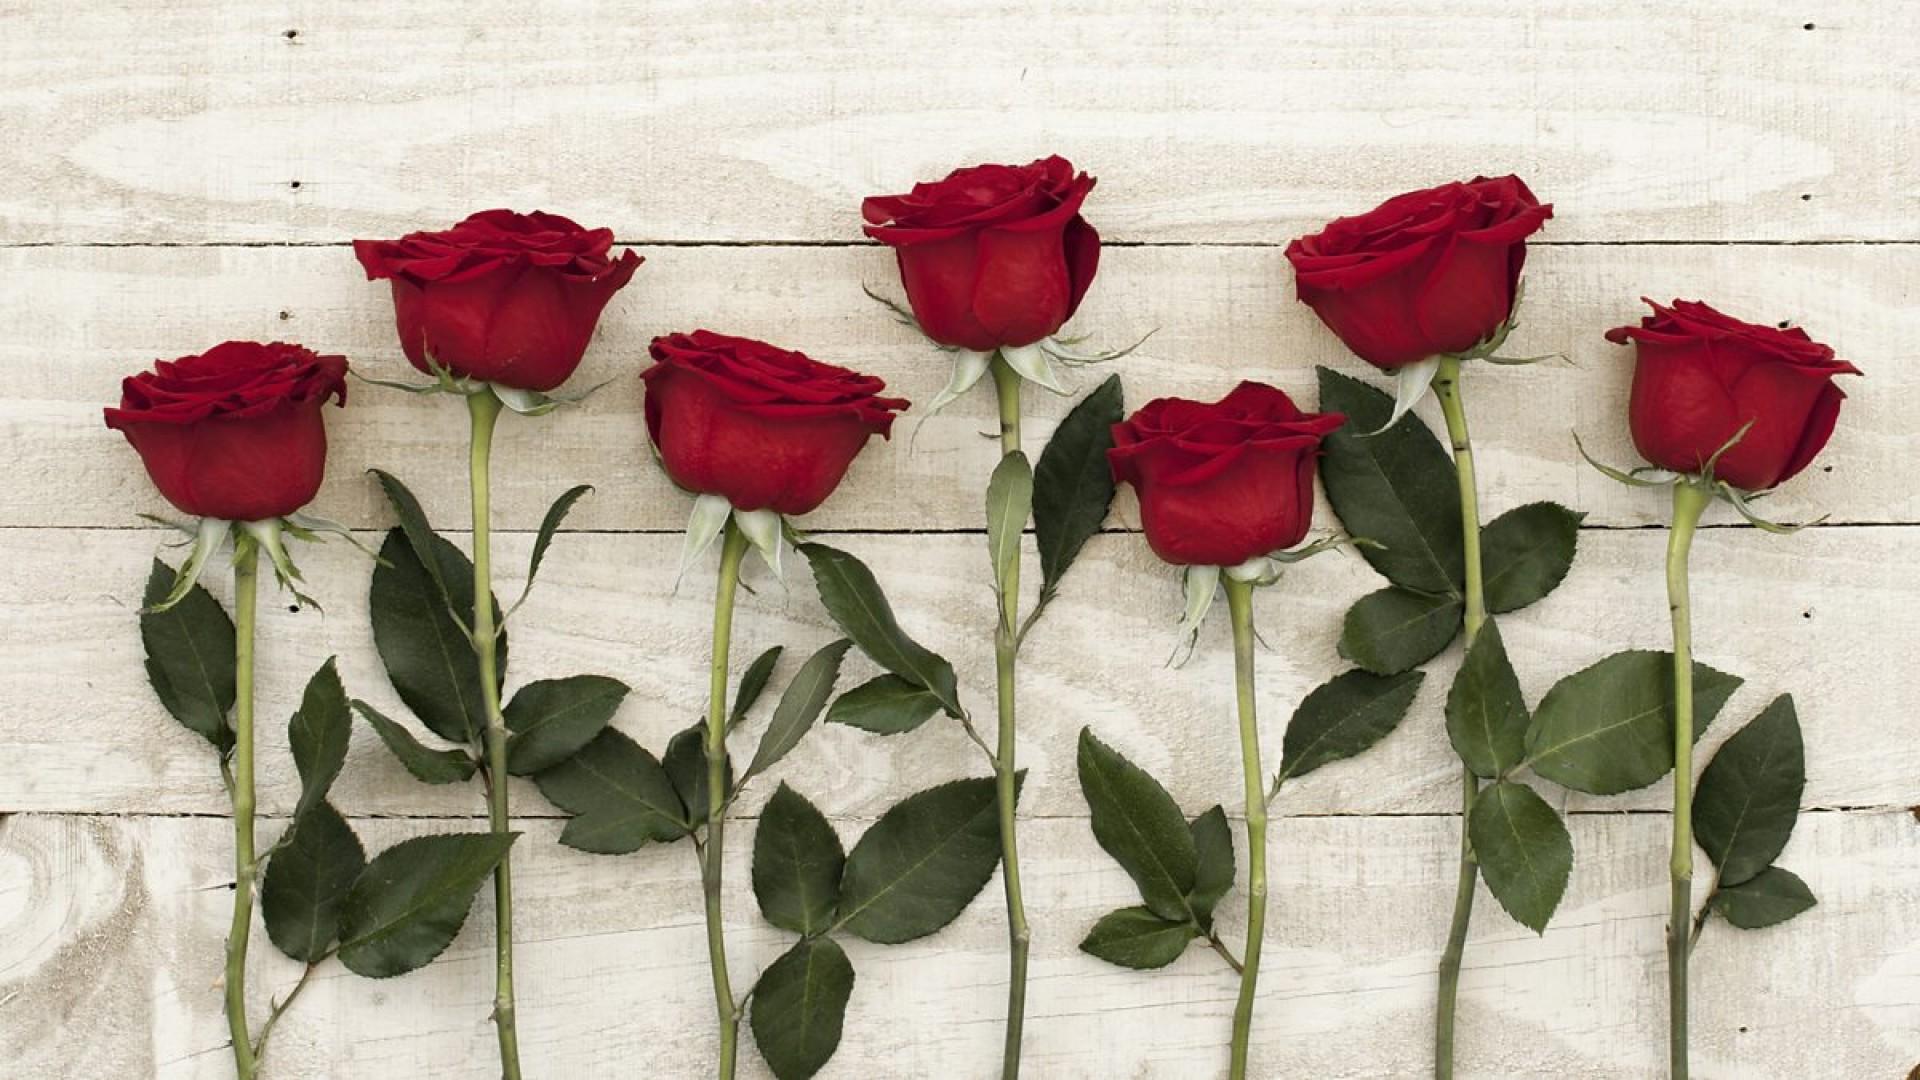 014 P047qgqf About Rose Flower Essay Unbelievable In Marathi Kannada Language 1920